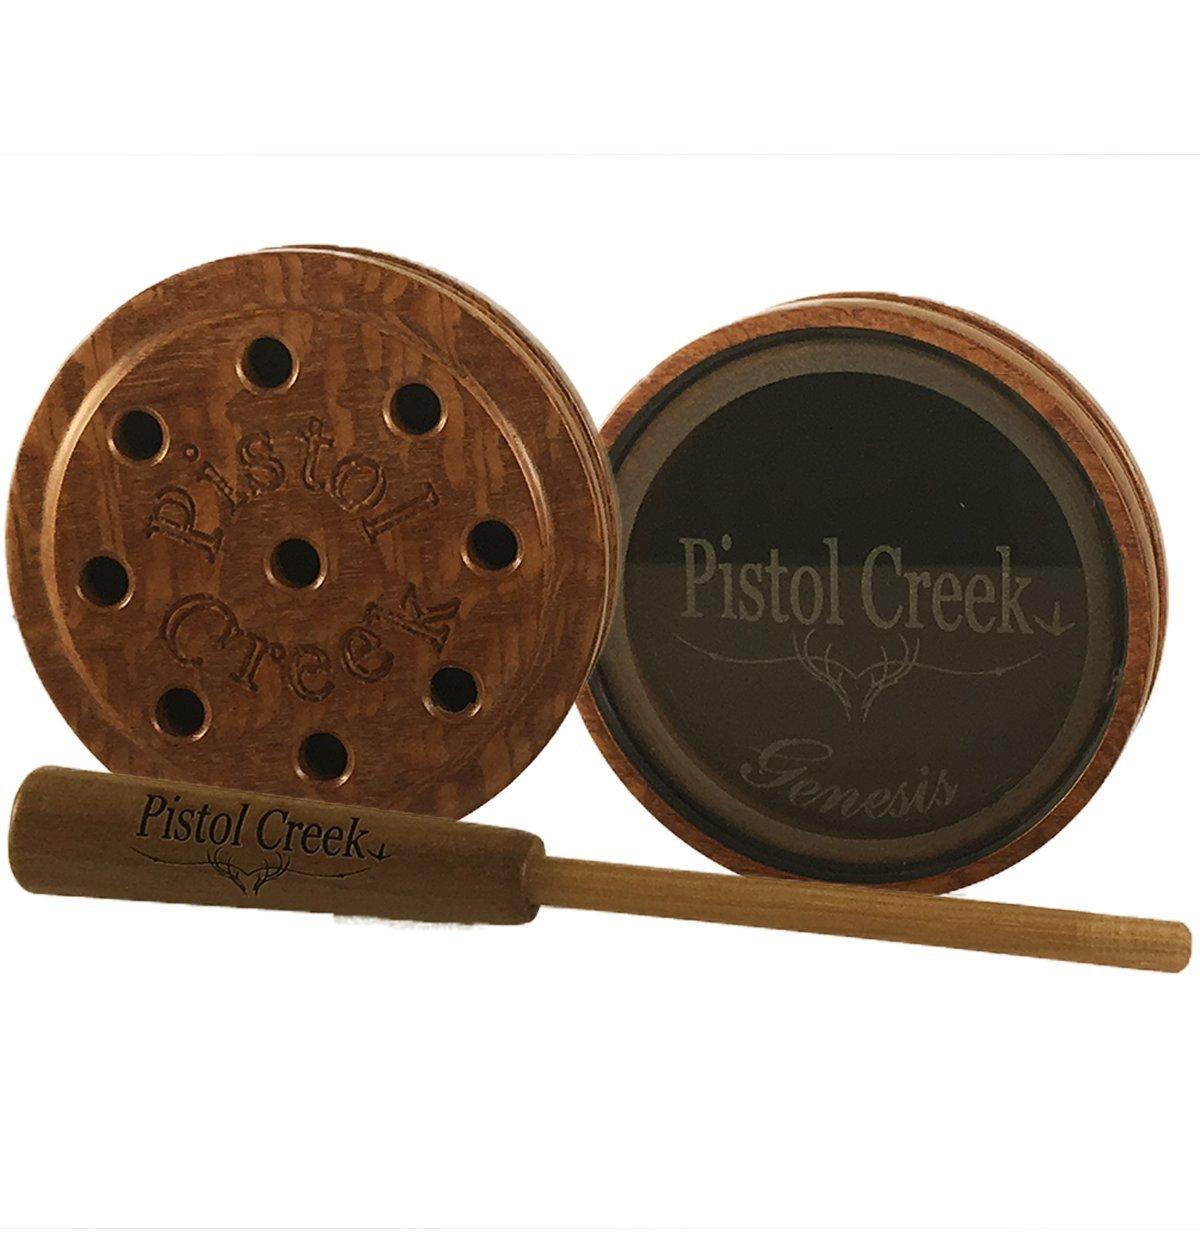 Pistol Creek Genesis Call- Glass over Aluminum by Pistol Creek (Image #2)